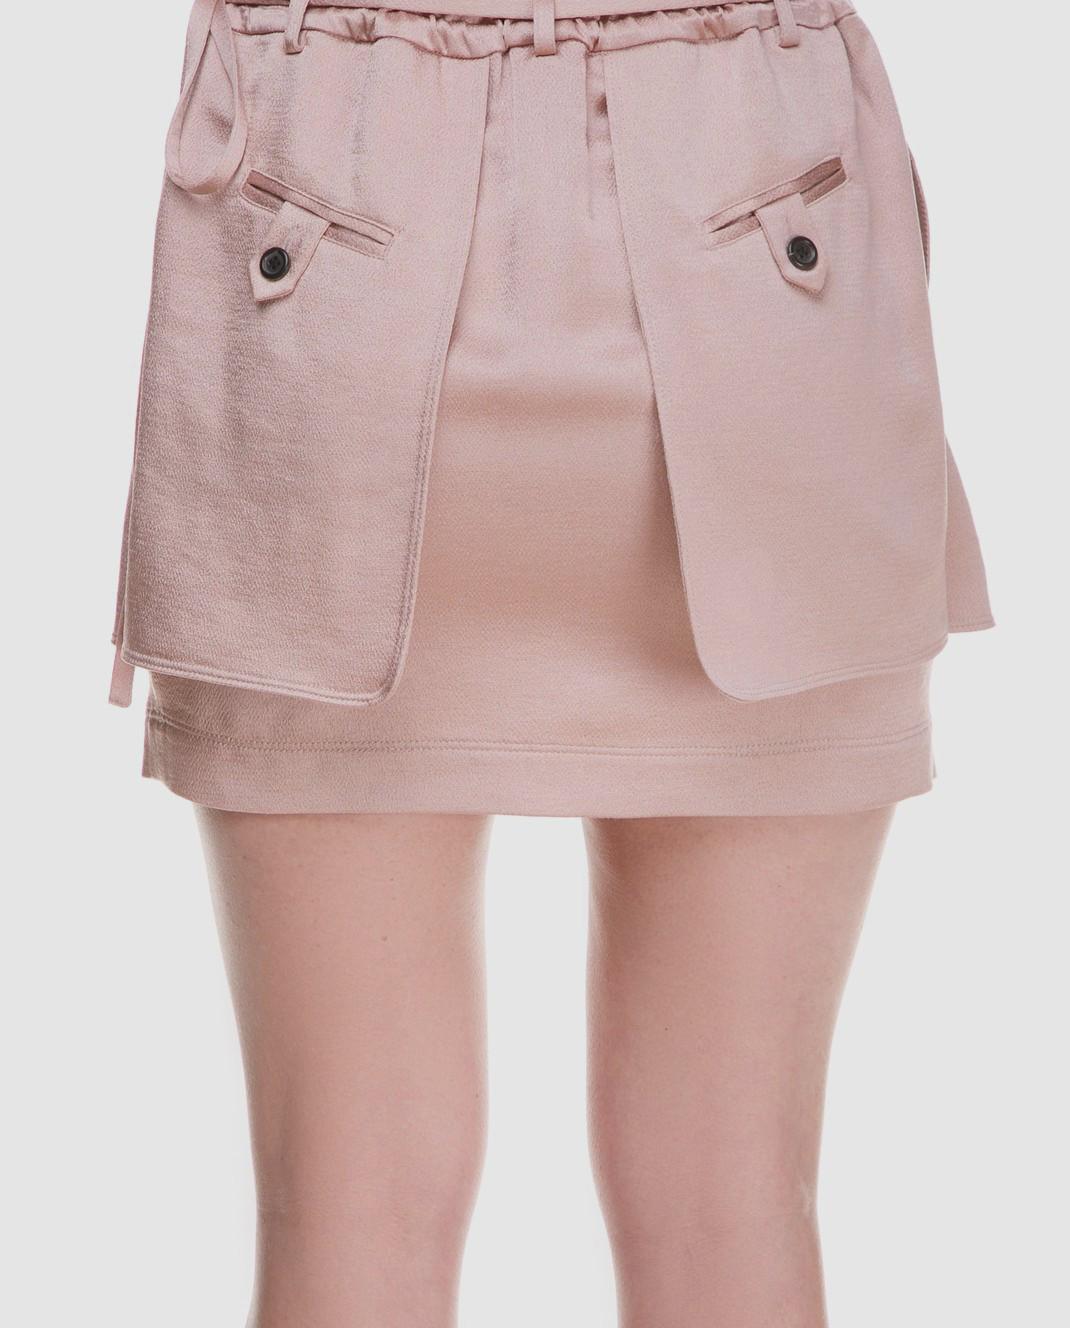 Valentino Розовая юбка PB0RA3K53H3 изображение 5